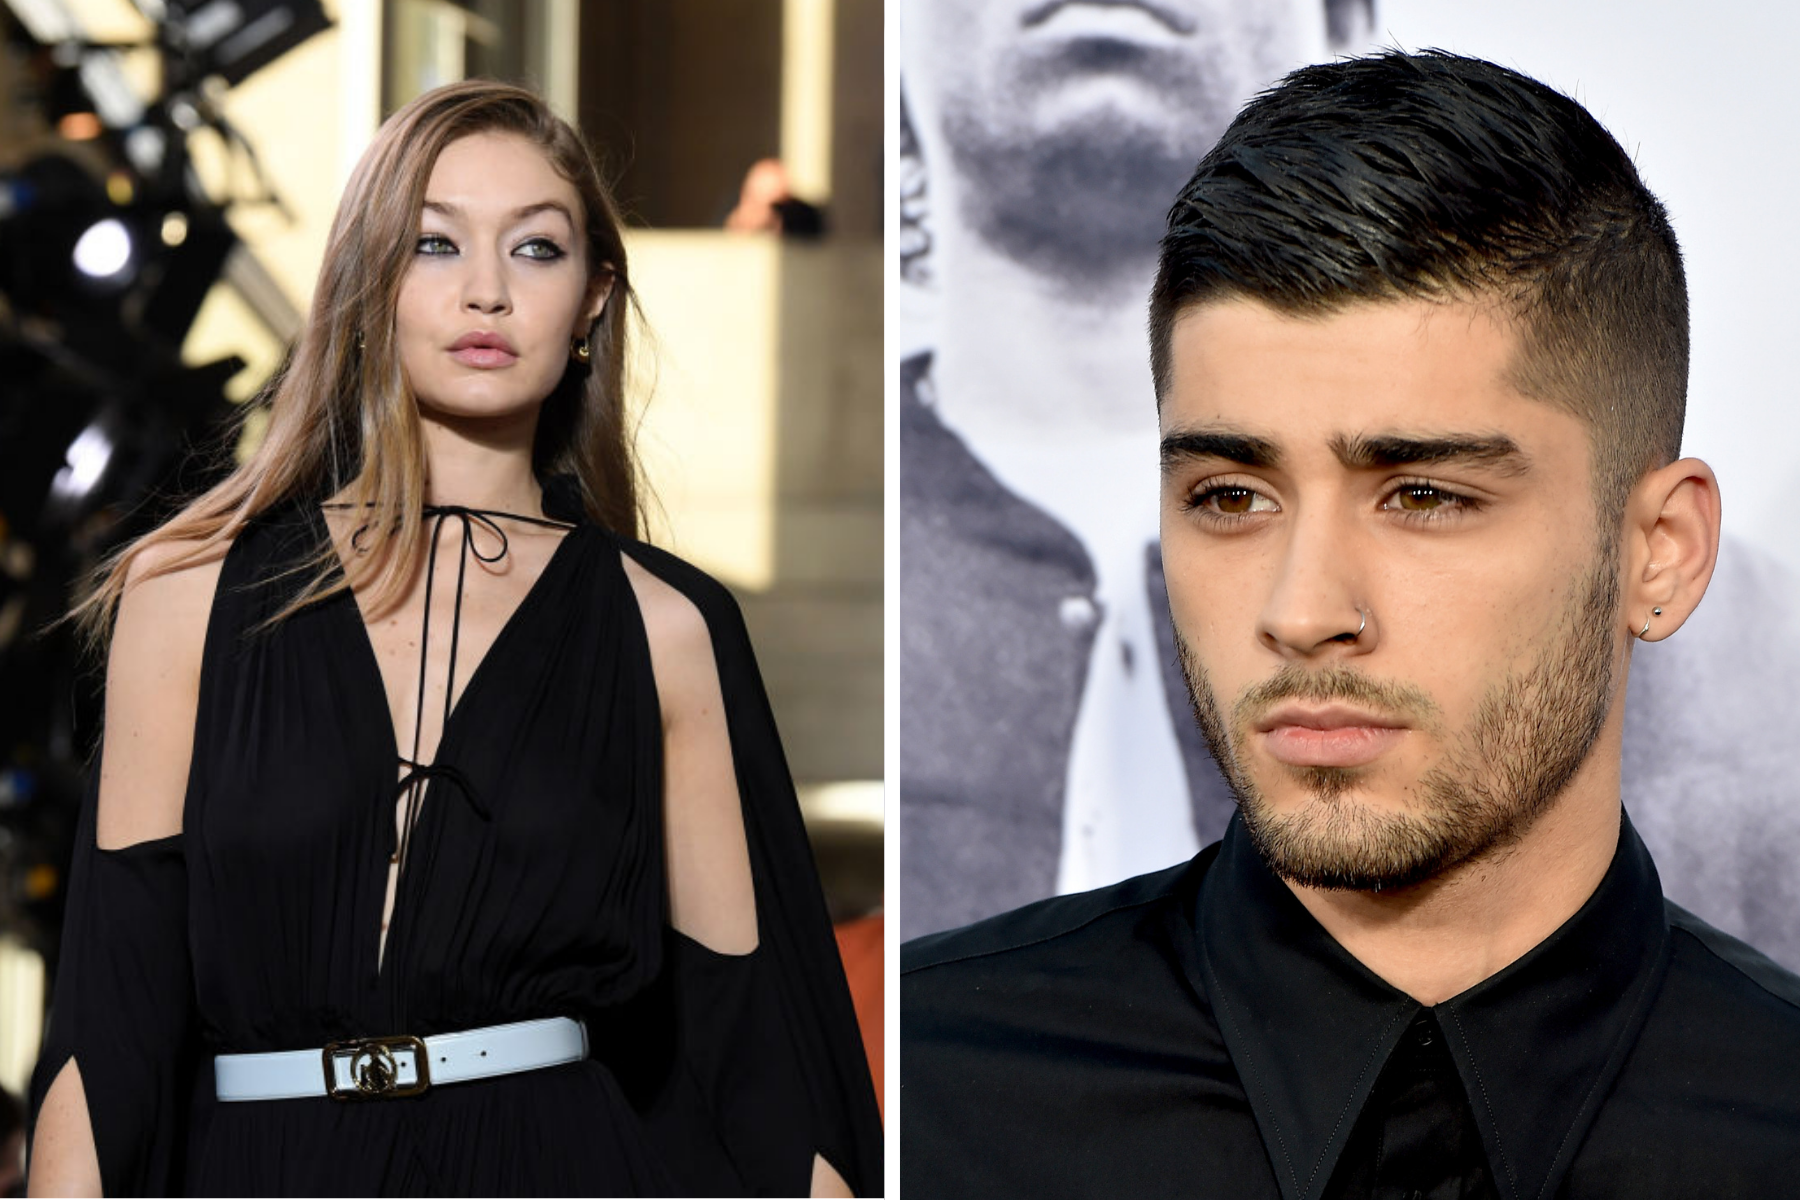 Are Zayn Malik And Gigi Hadid Married?